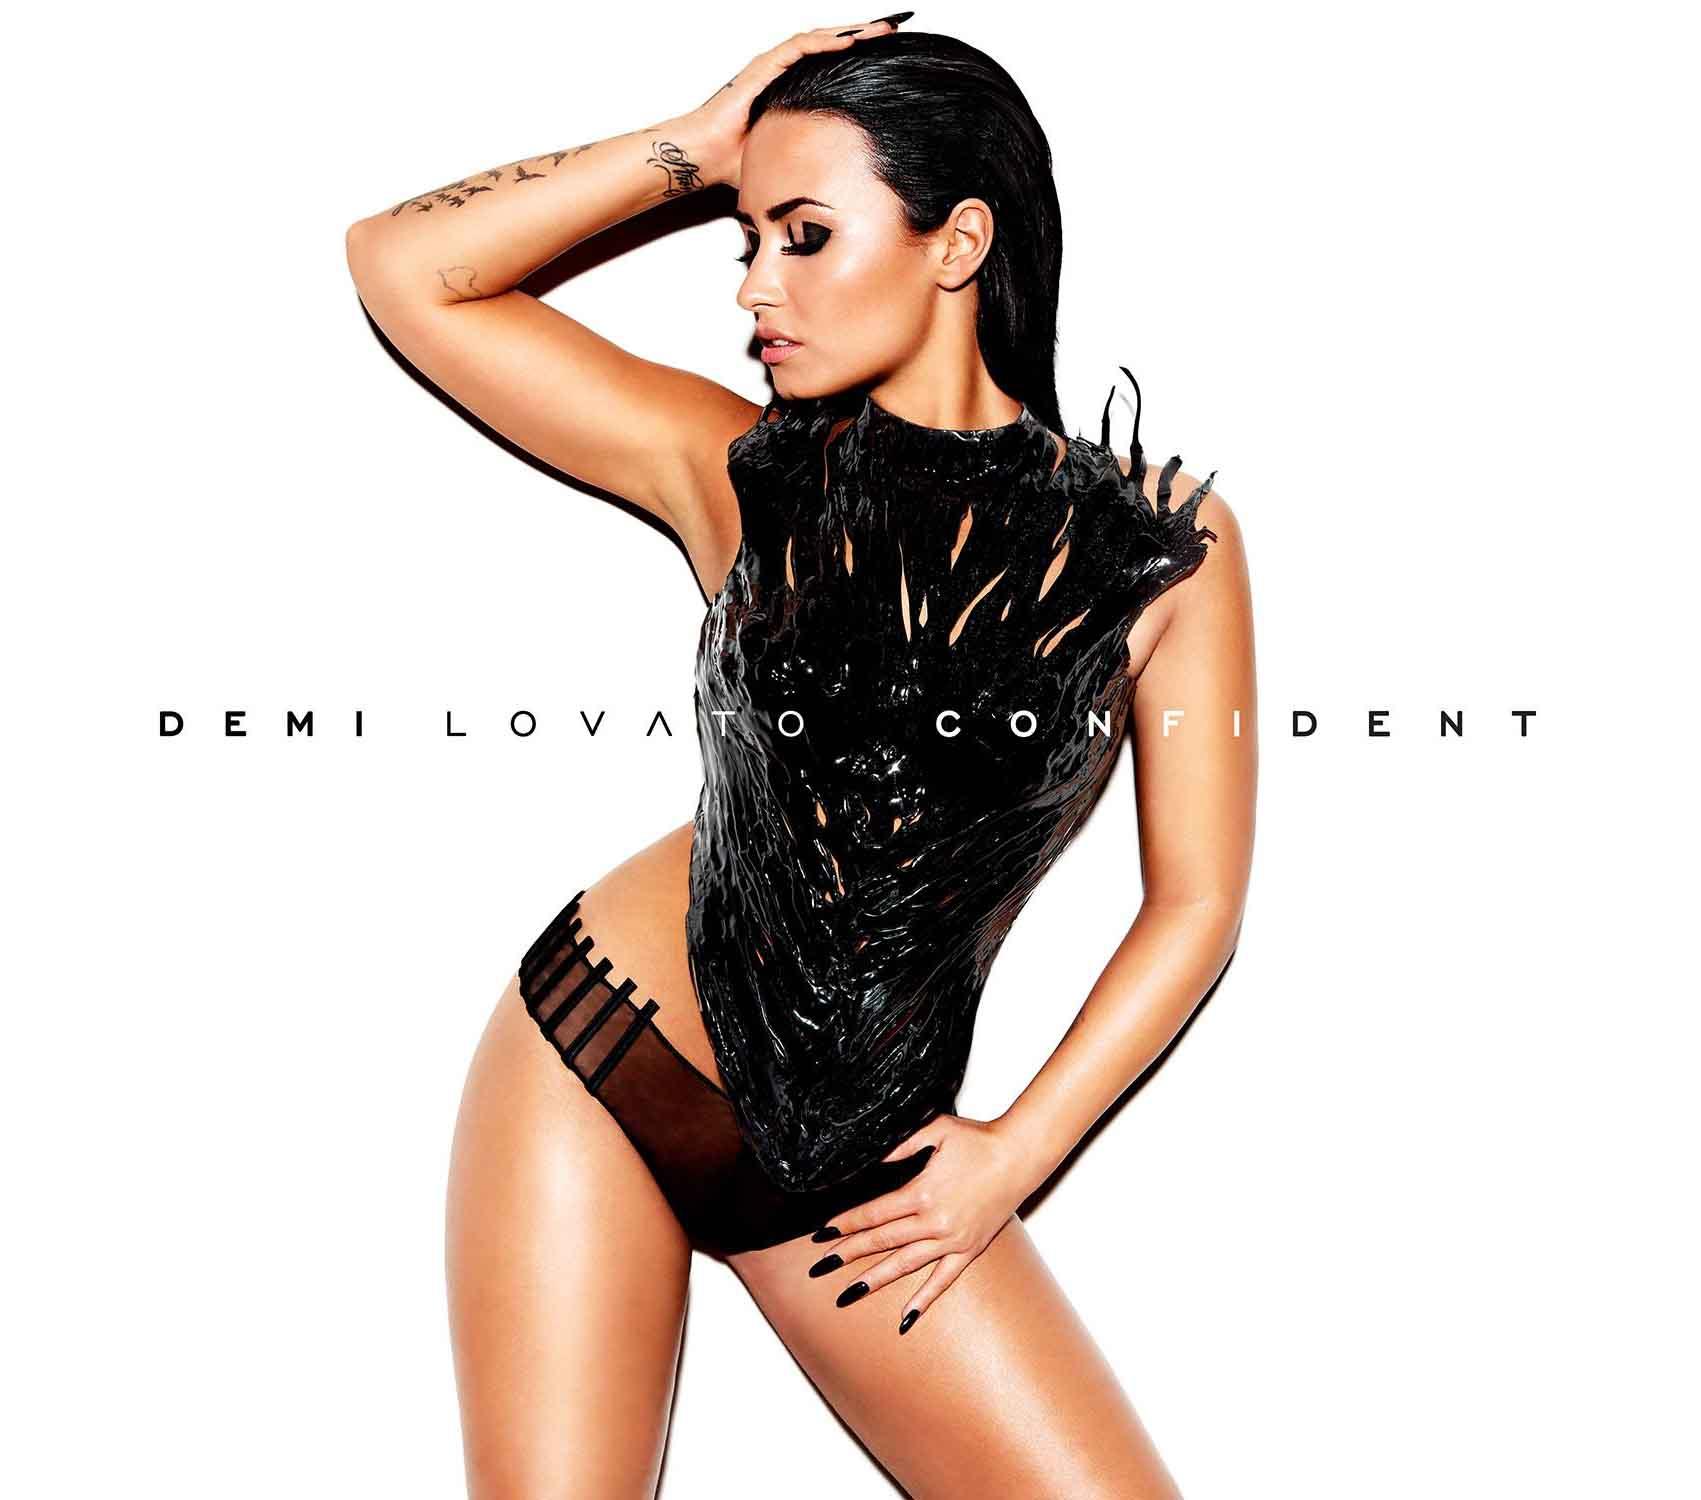 Confident  album cover (Hollywood Records/Island Records).